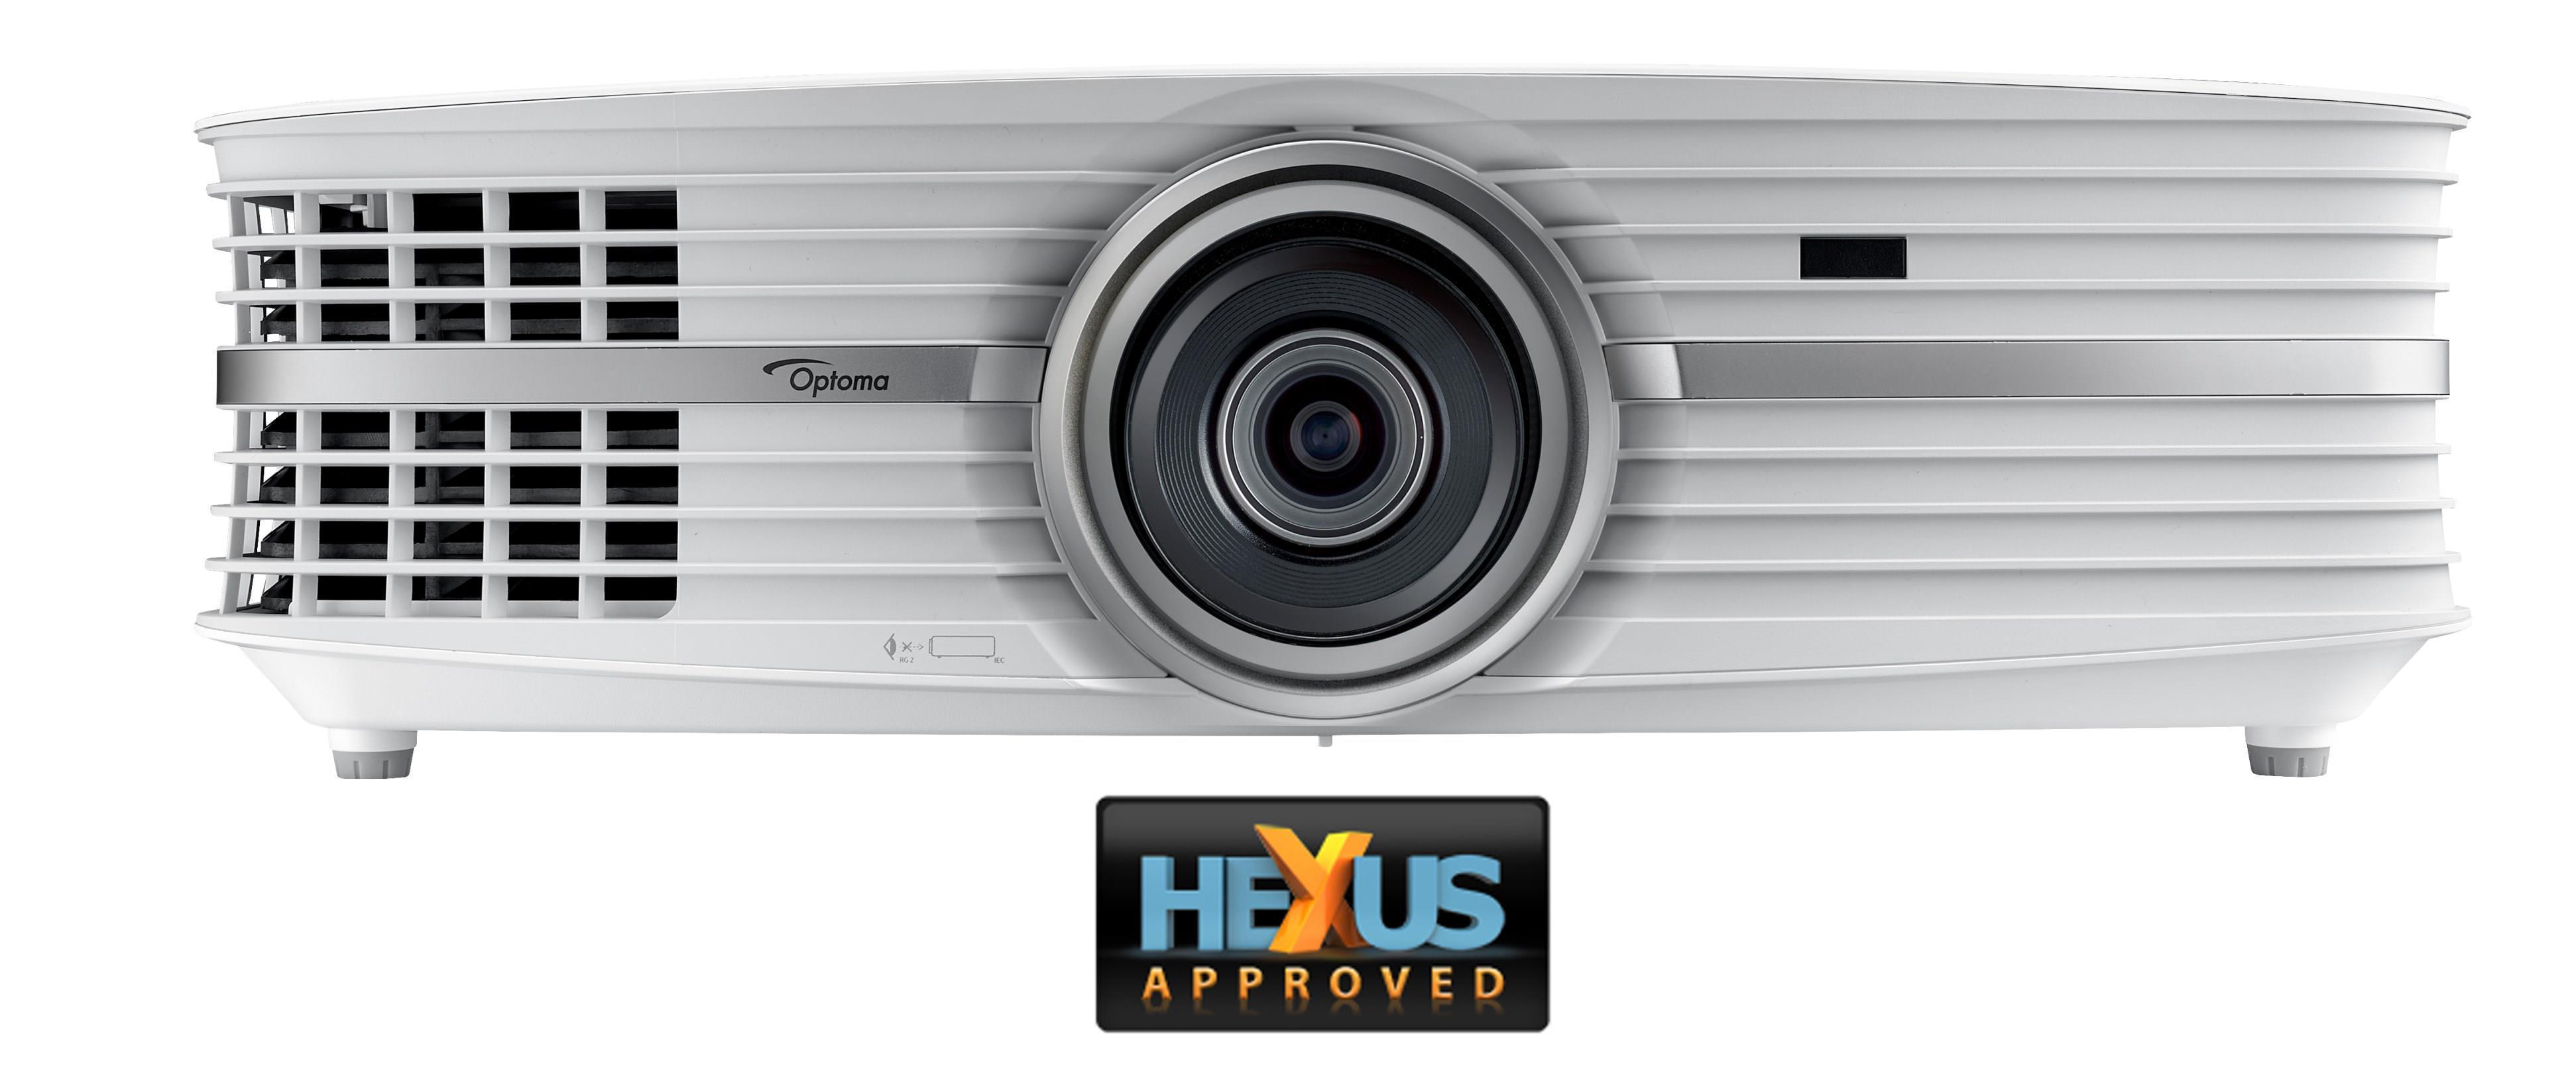 Epson Eb 595wi Finger Touch Wxga Projector Eb595w Electronic Deals W04 Optoma Uhd550x 4k Uhd Rec 709 Home Cinema